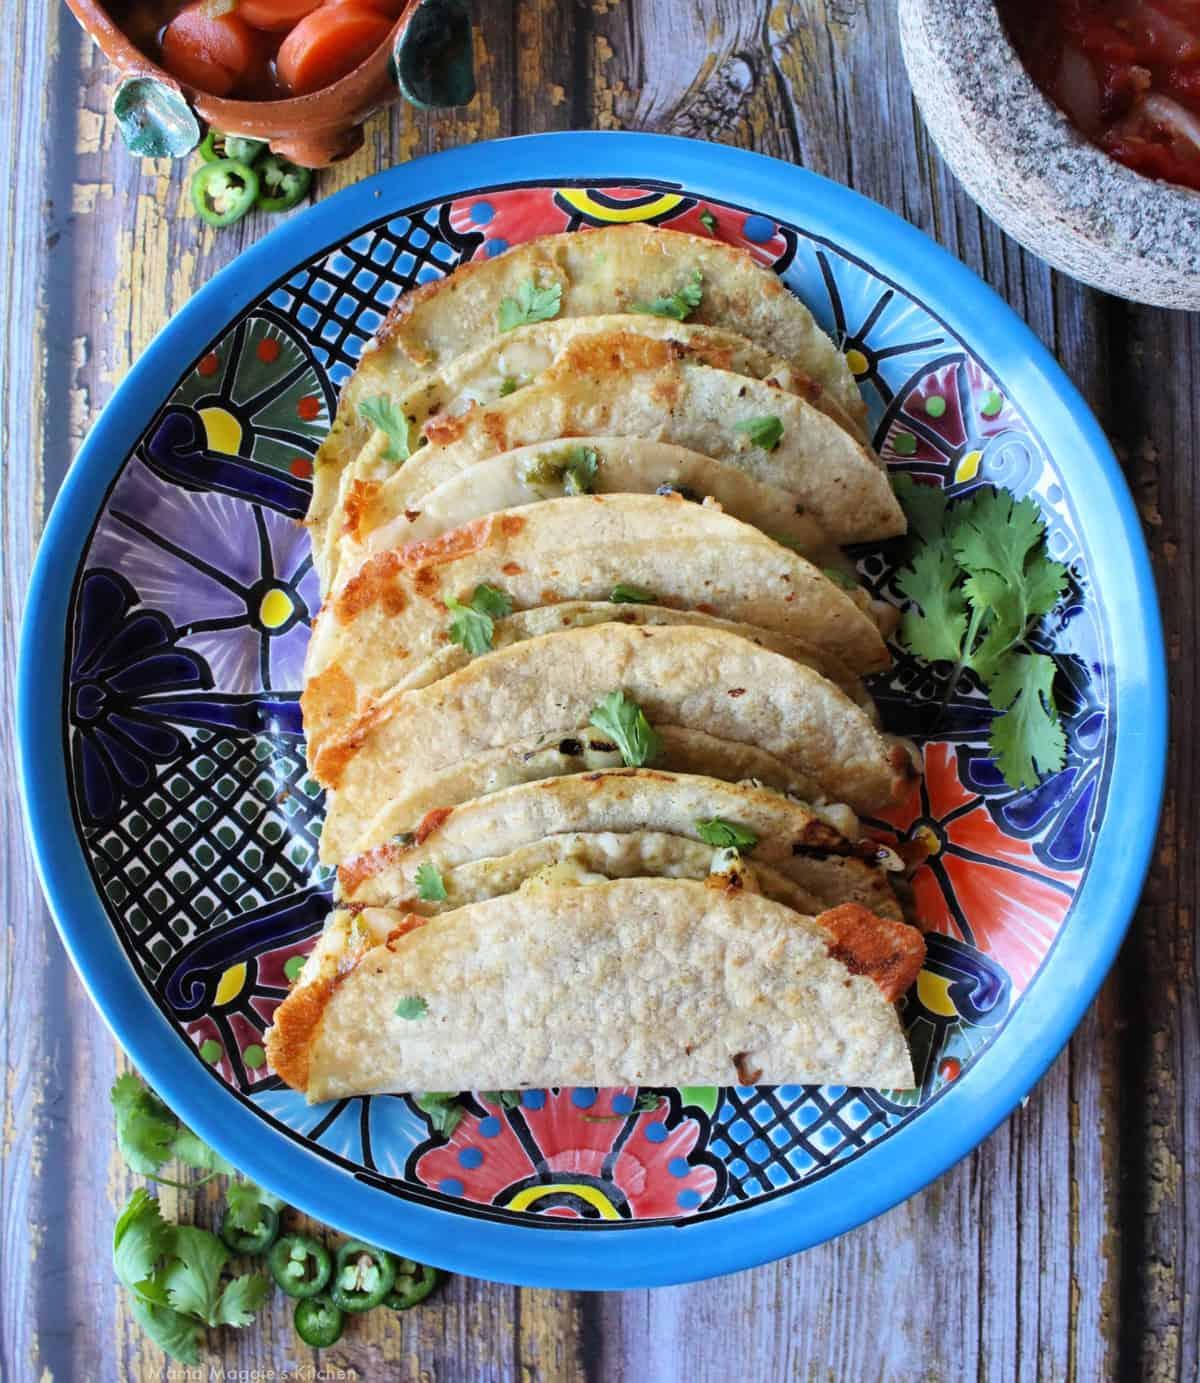 Tacos Gobernado stacked on a decorative blue talavera plate.